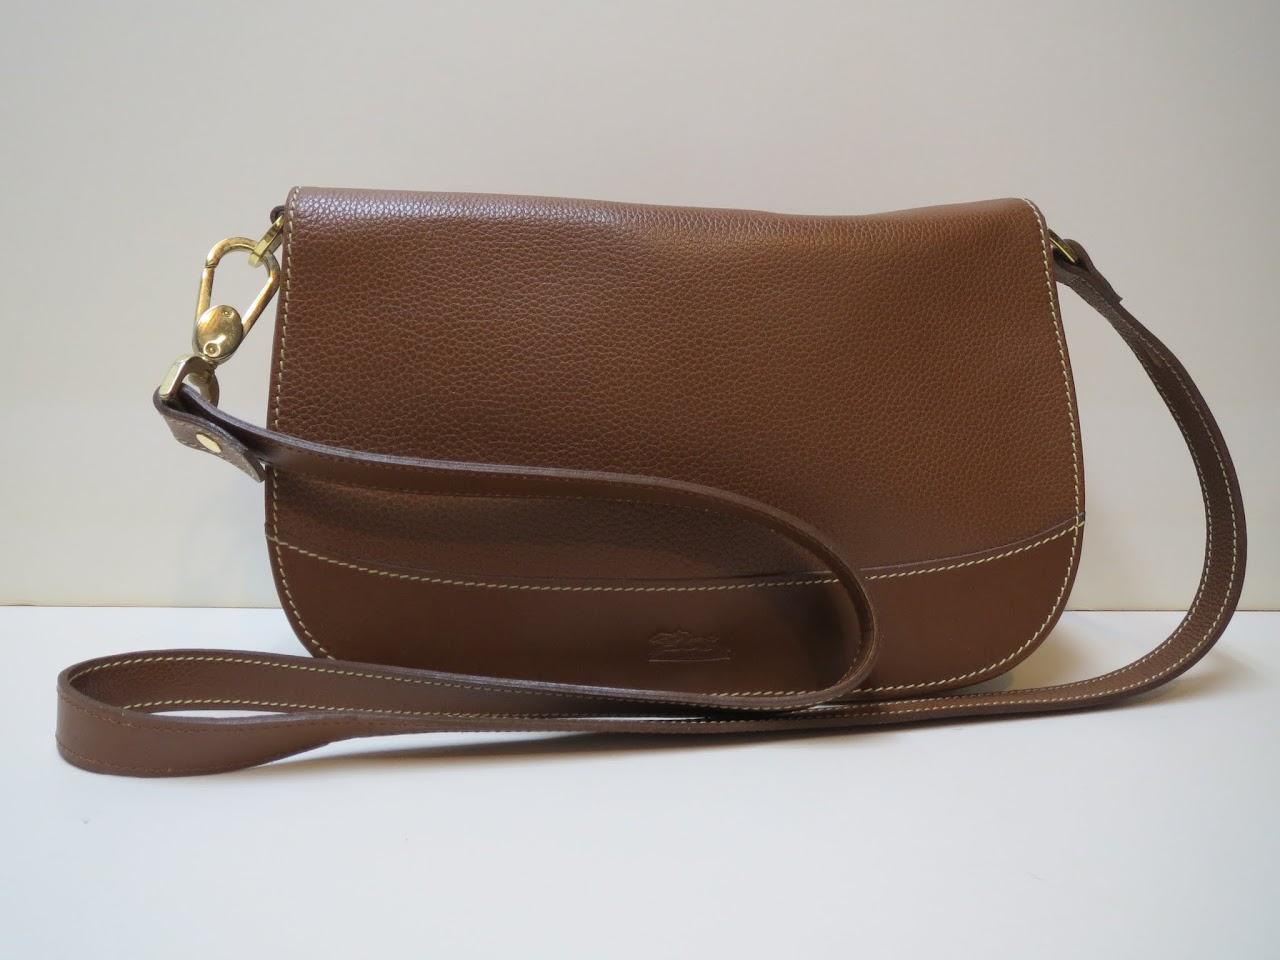 Lonchamp Crossbody Bag